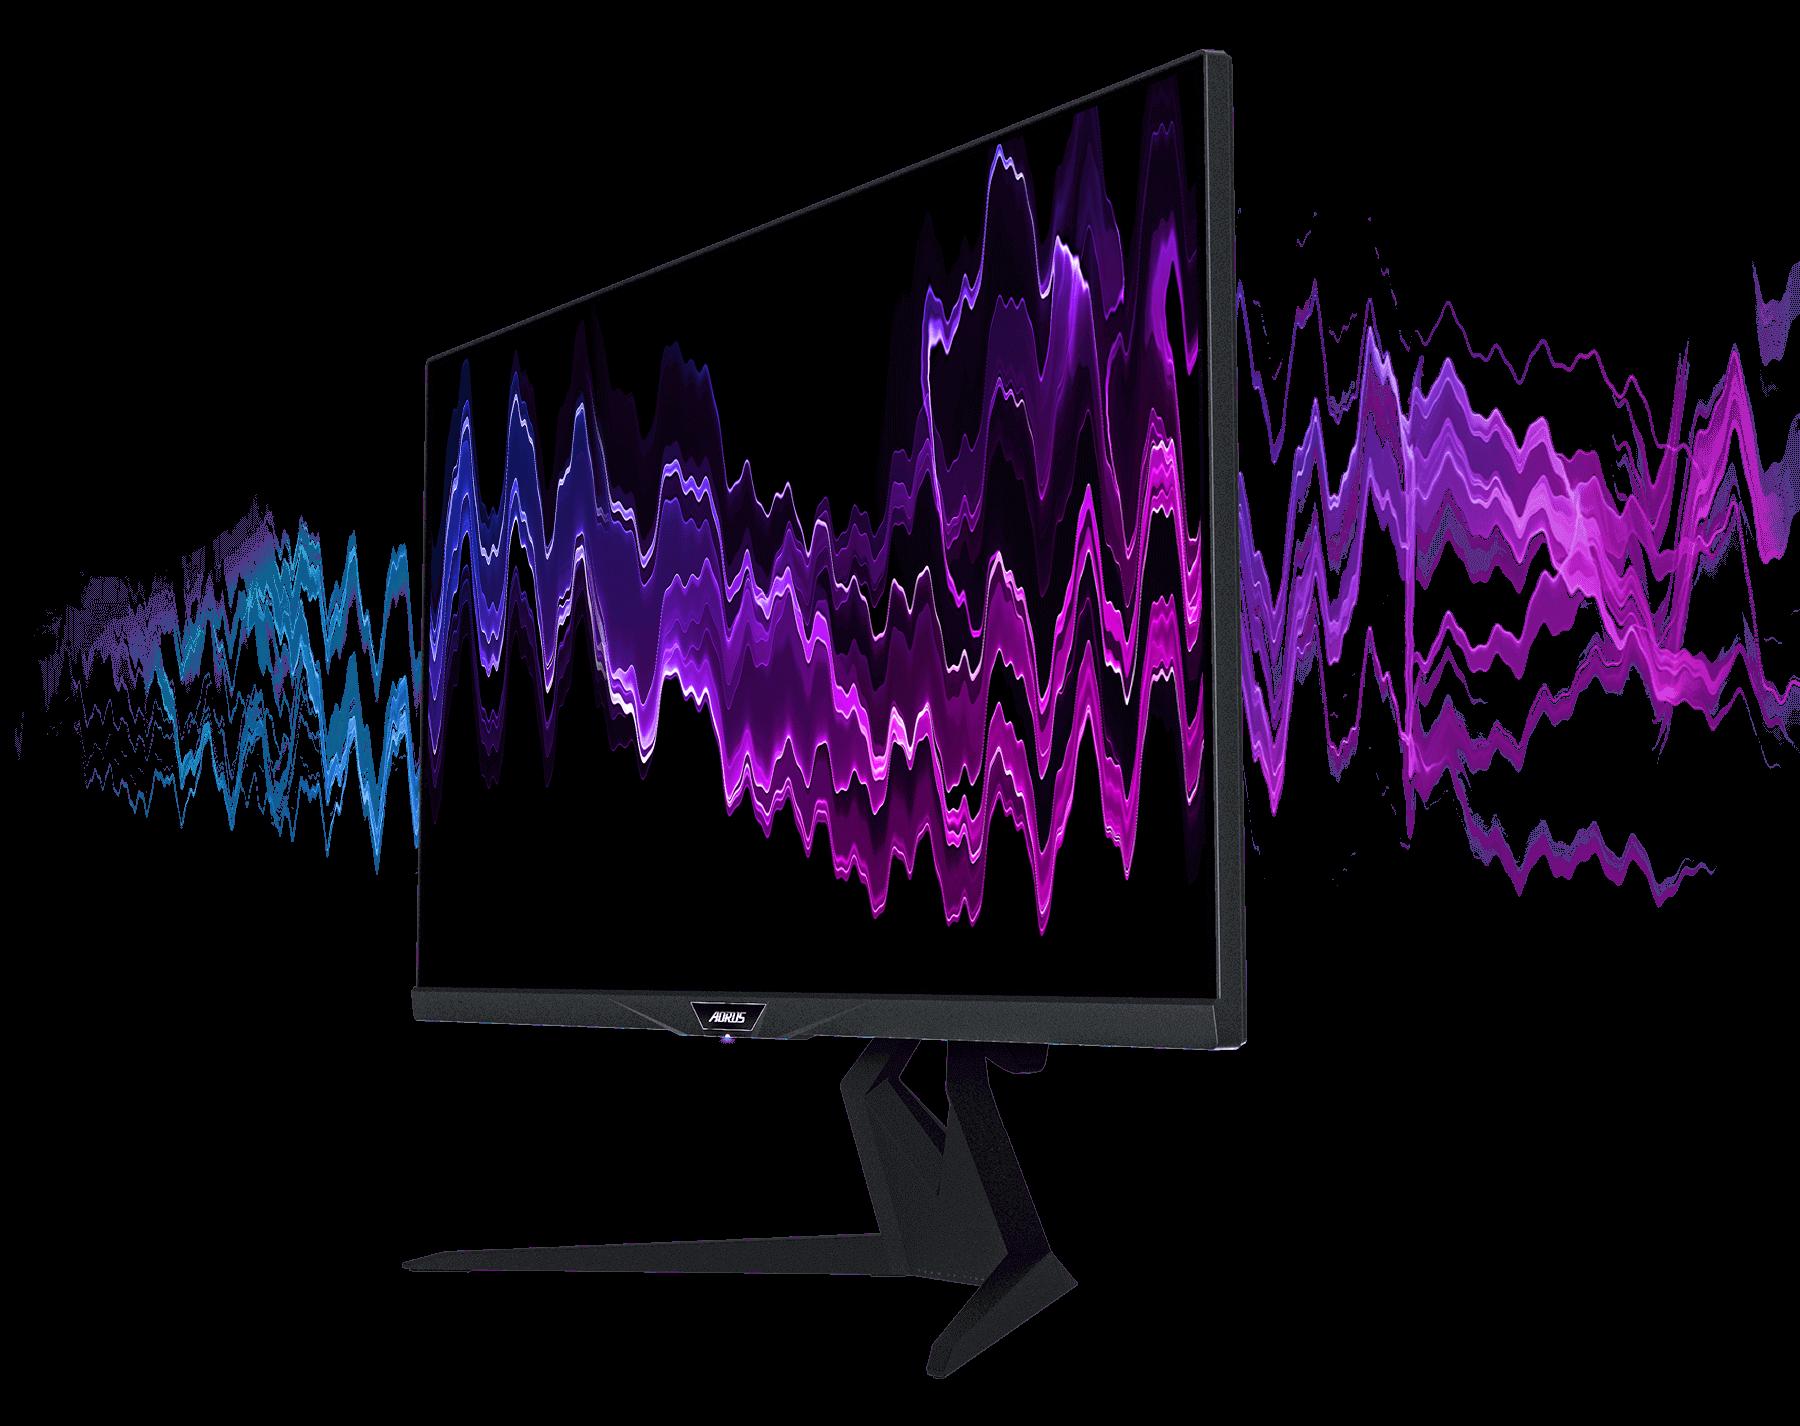 Gigabyte Gigabyte Gaming Monitor AORUS FI32Q-EU 32 , QHD, 2560 x 1440 pixels, HDMI ports quantity 2